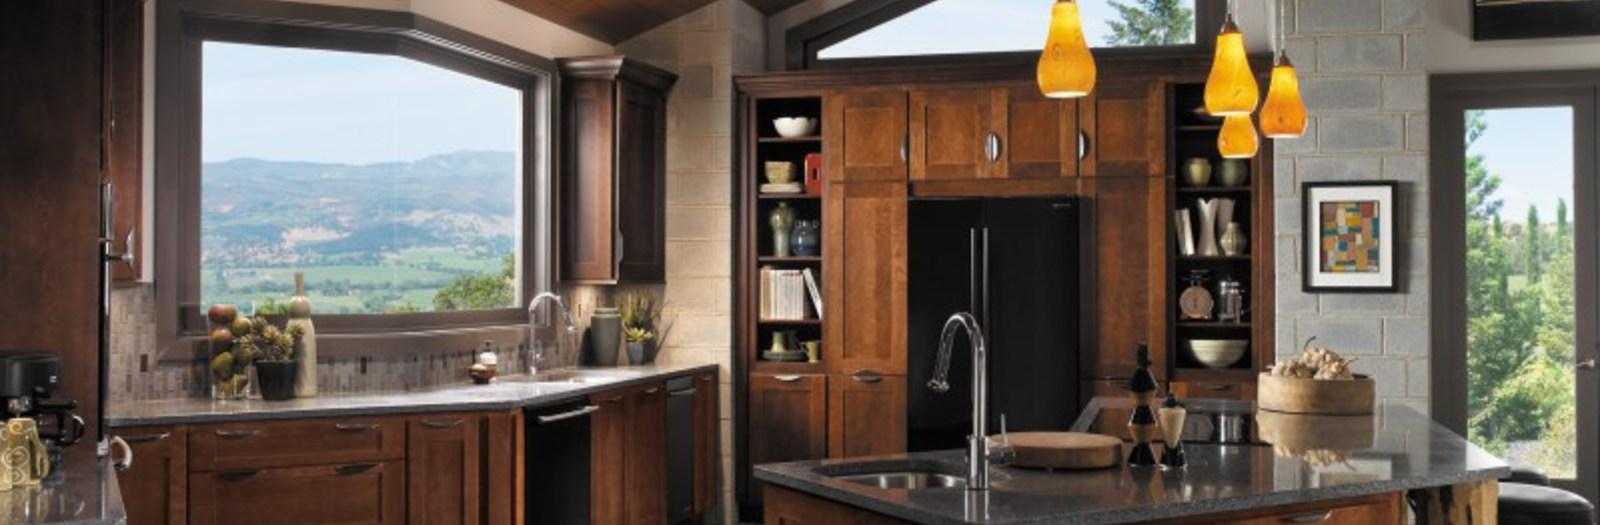 Ideas for home design decorating and remodeling designmine for Kitchen depot little falls nj